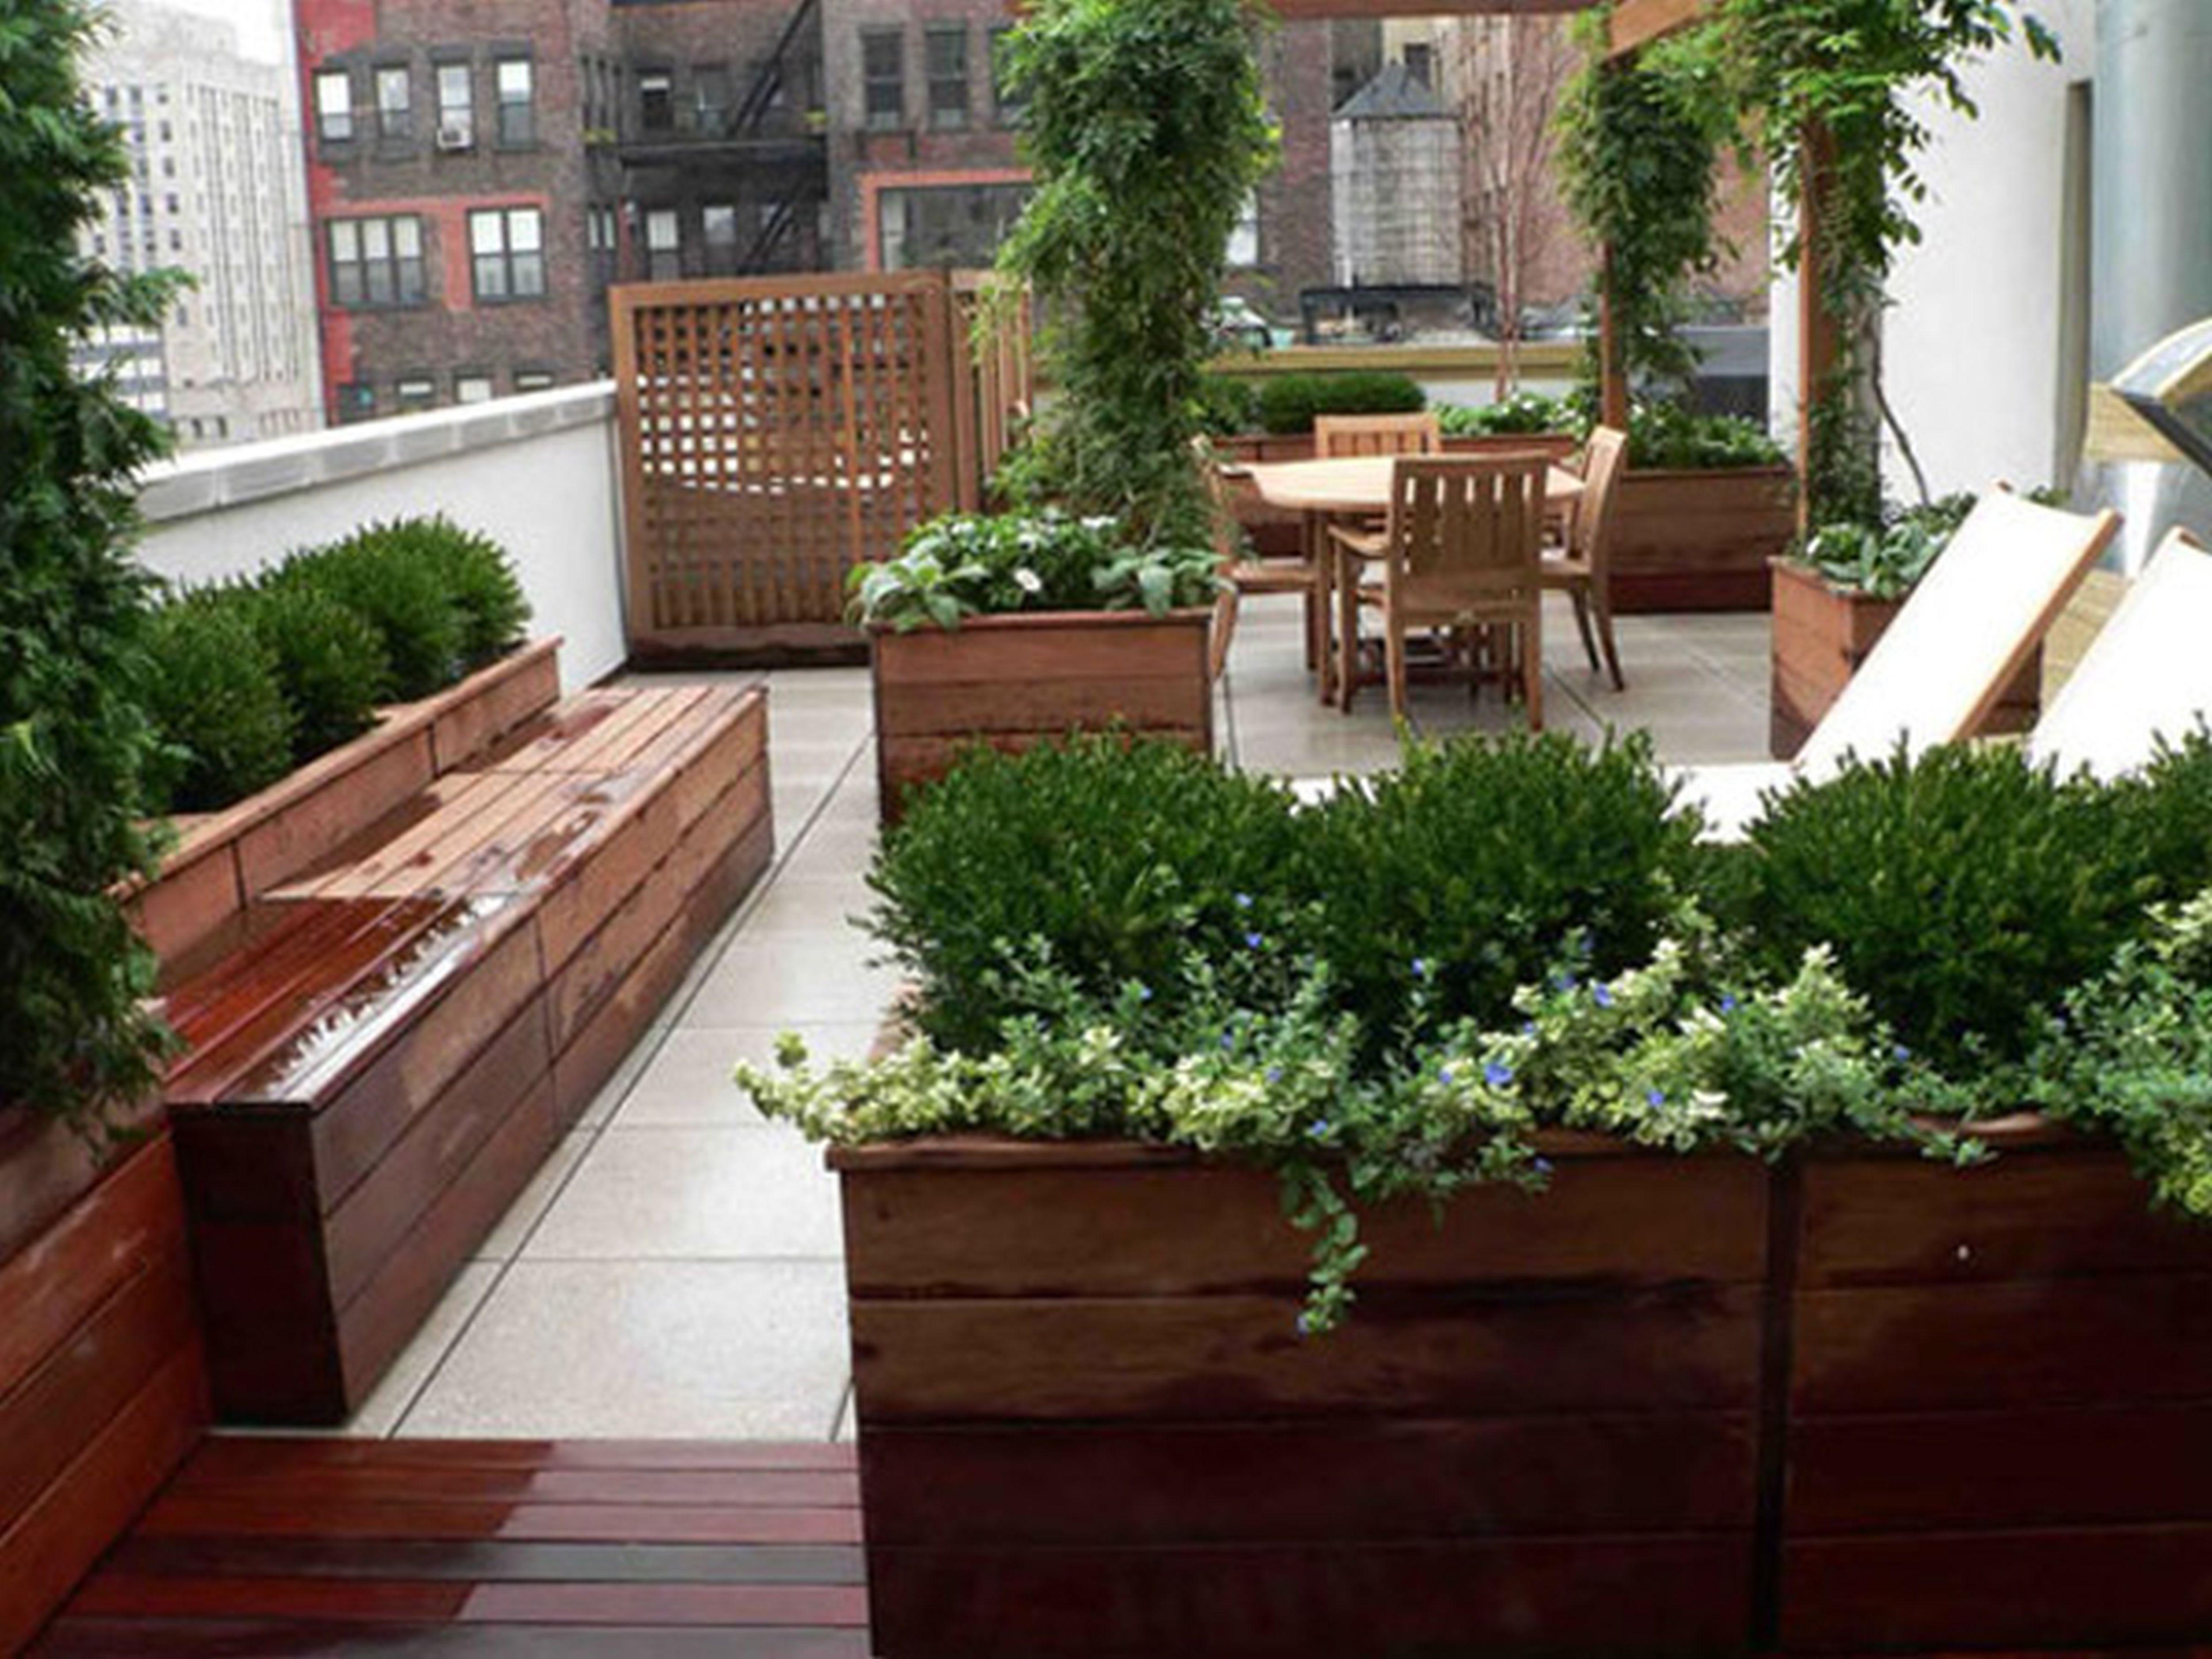 Garden Rooftop Decoration Ideas   Http://www.hikris.com/5411